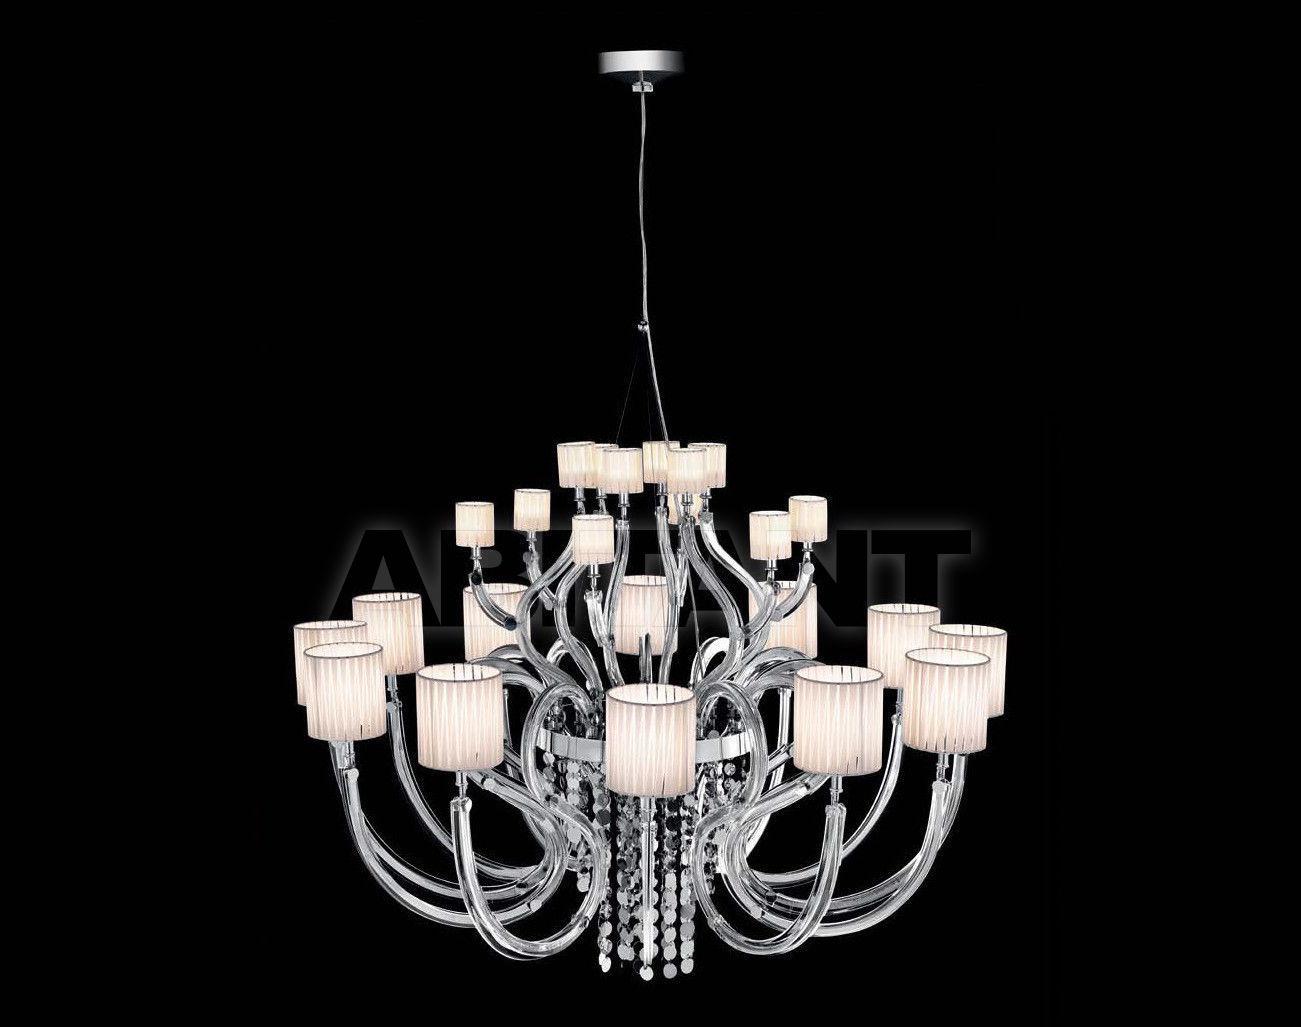 Купить Люстра Beby Group Prive' Collection 0215B03